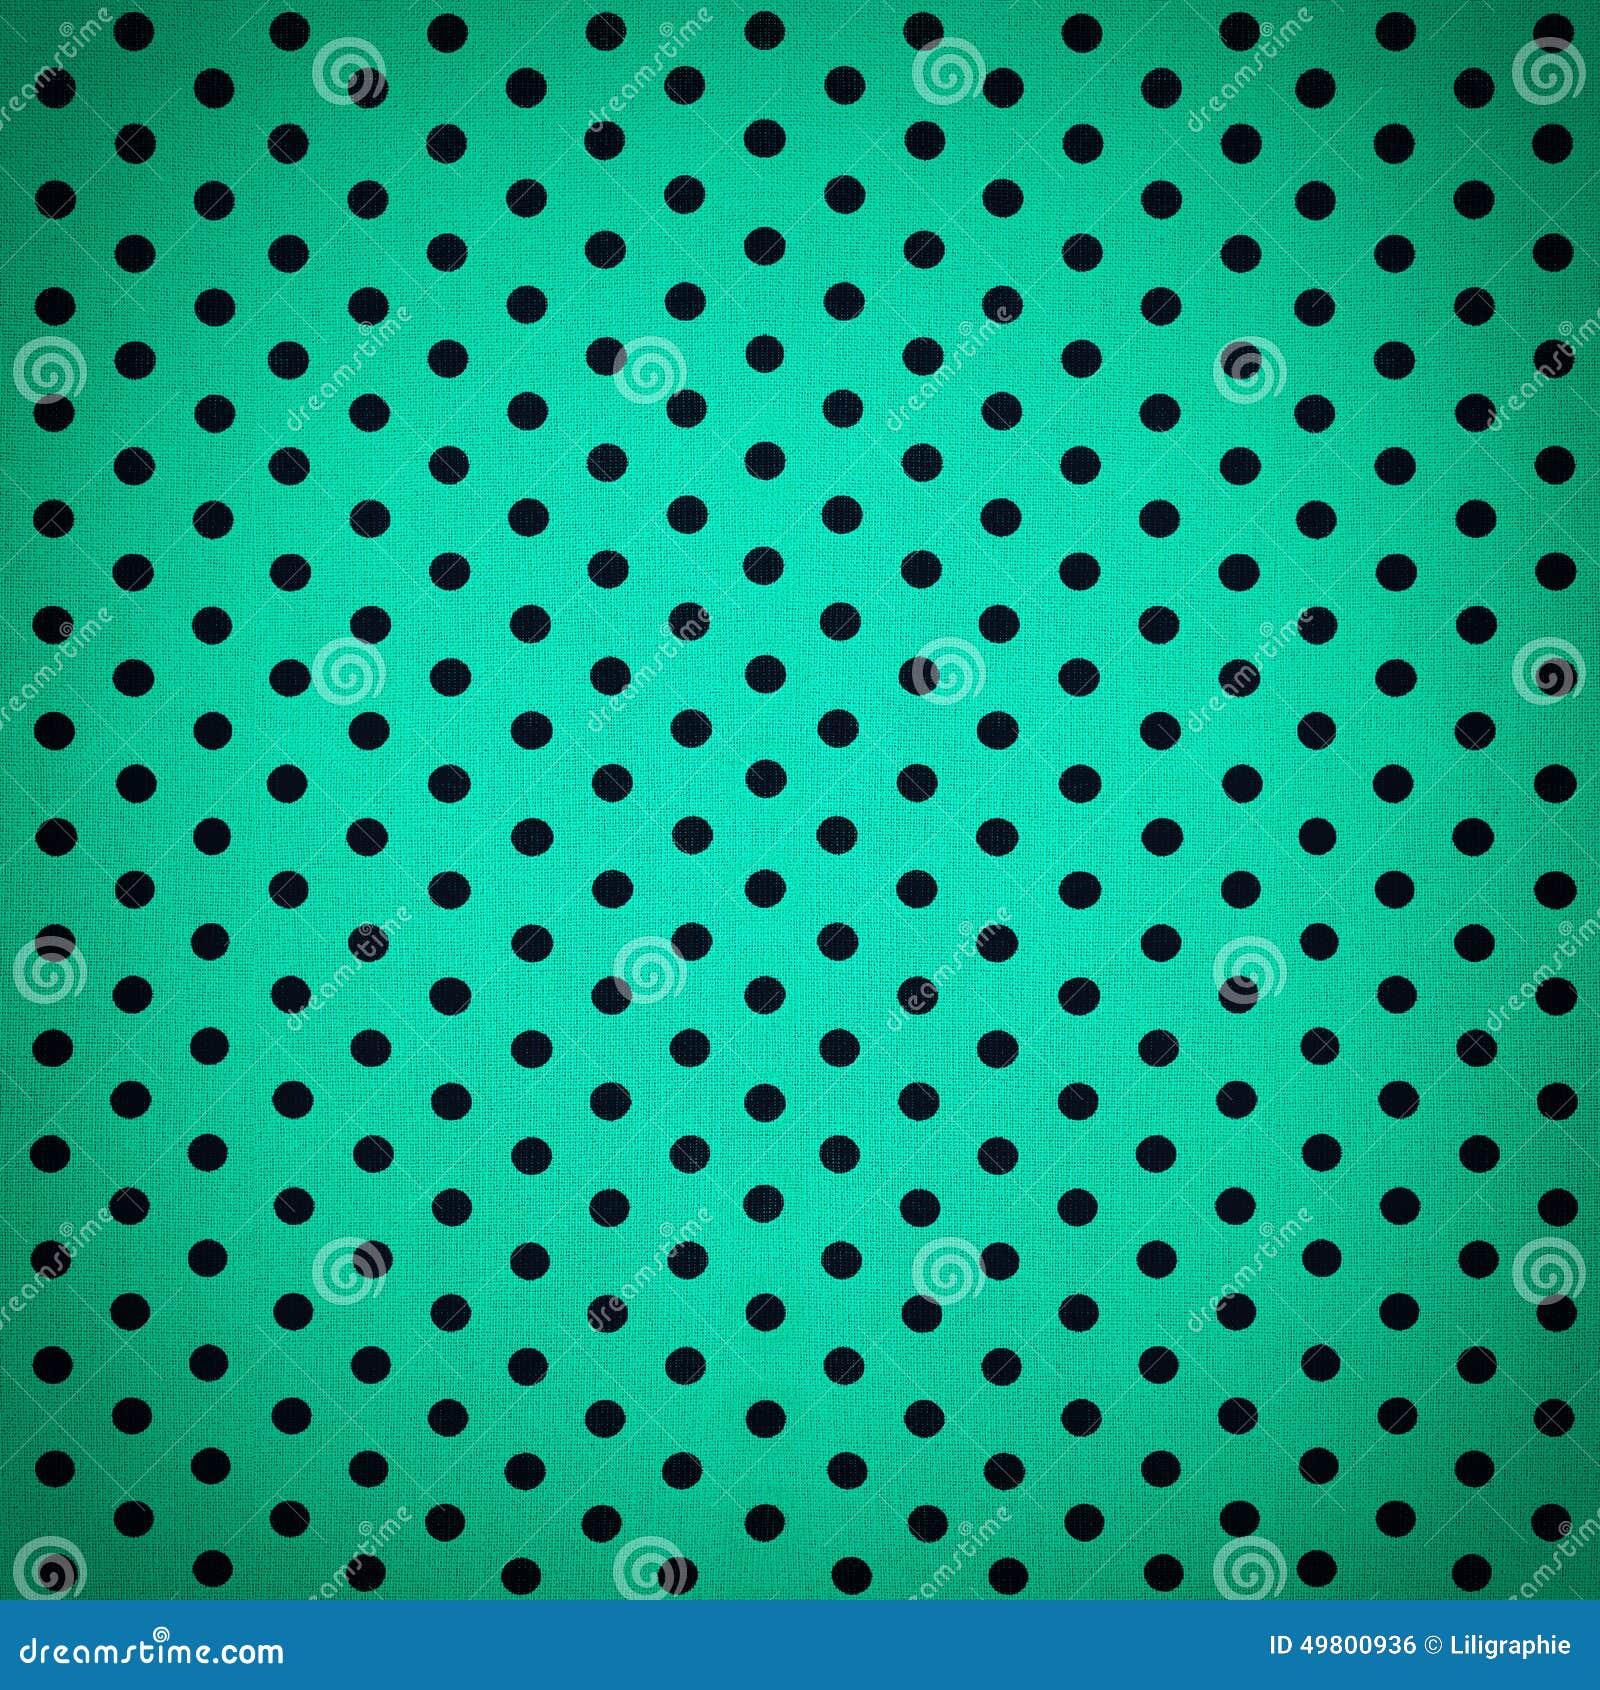 turquoise blue white polka dot background grungy vintage